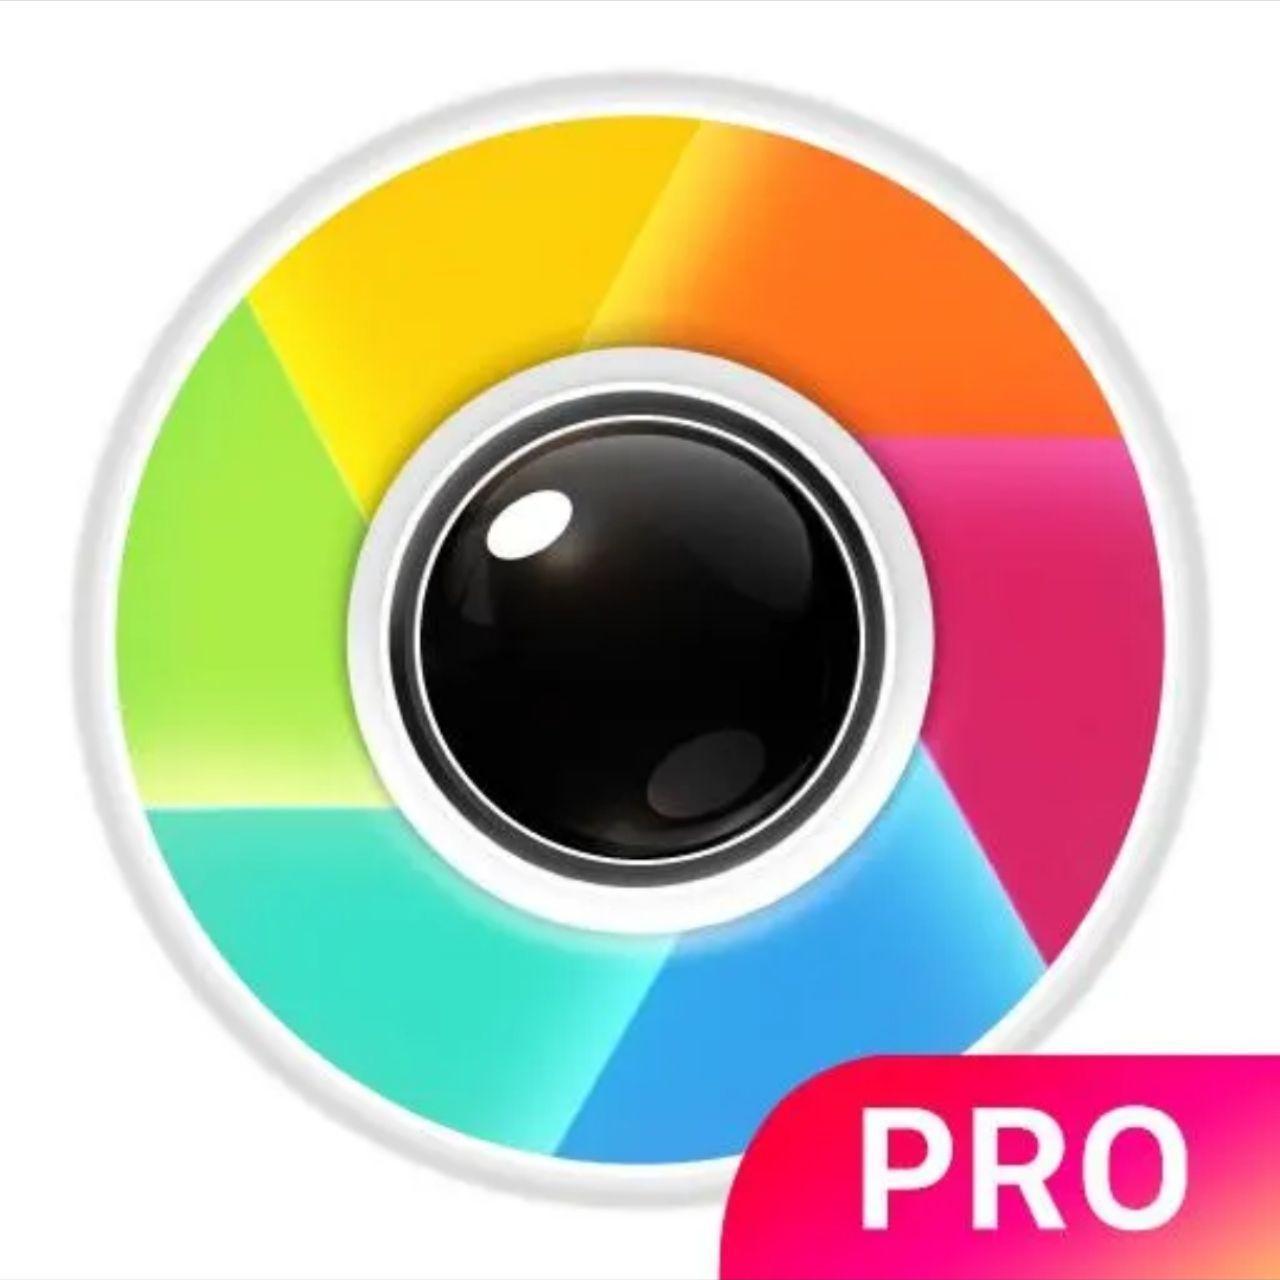 تطبيق سلفي باسلوب احترافيSweet Selfie Pro Beauty camera